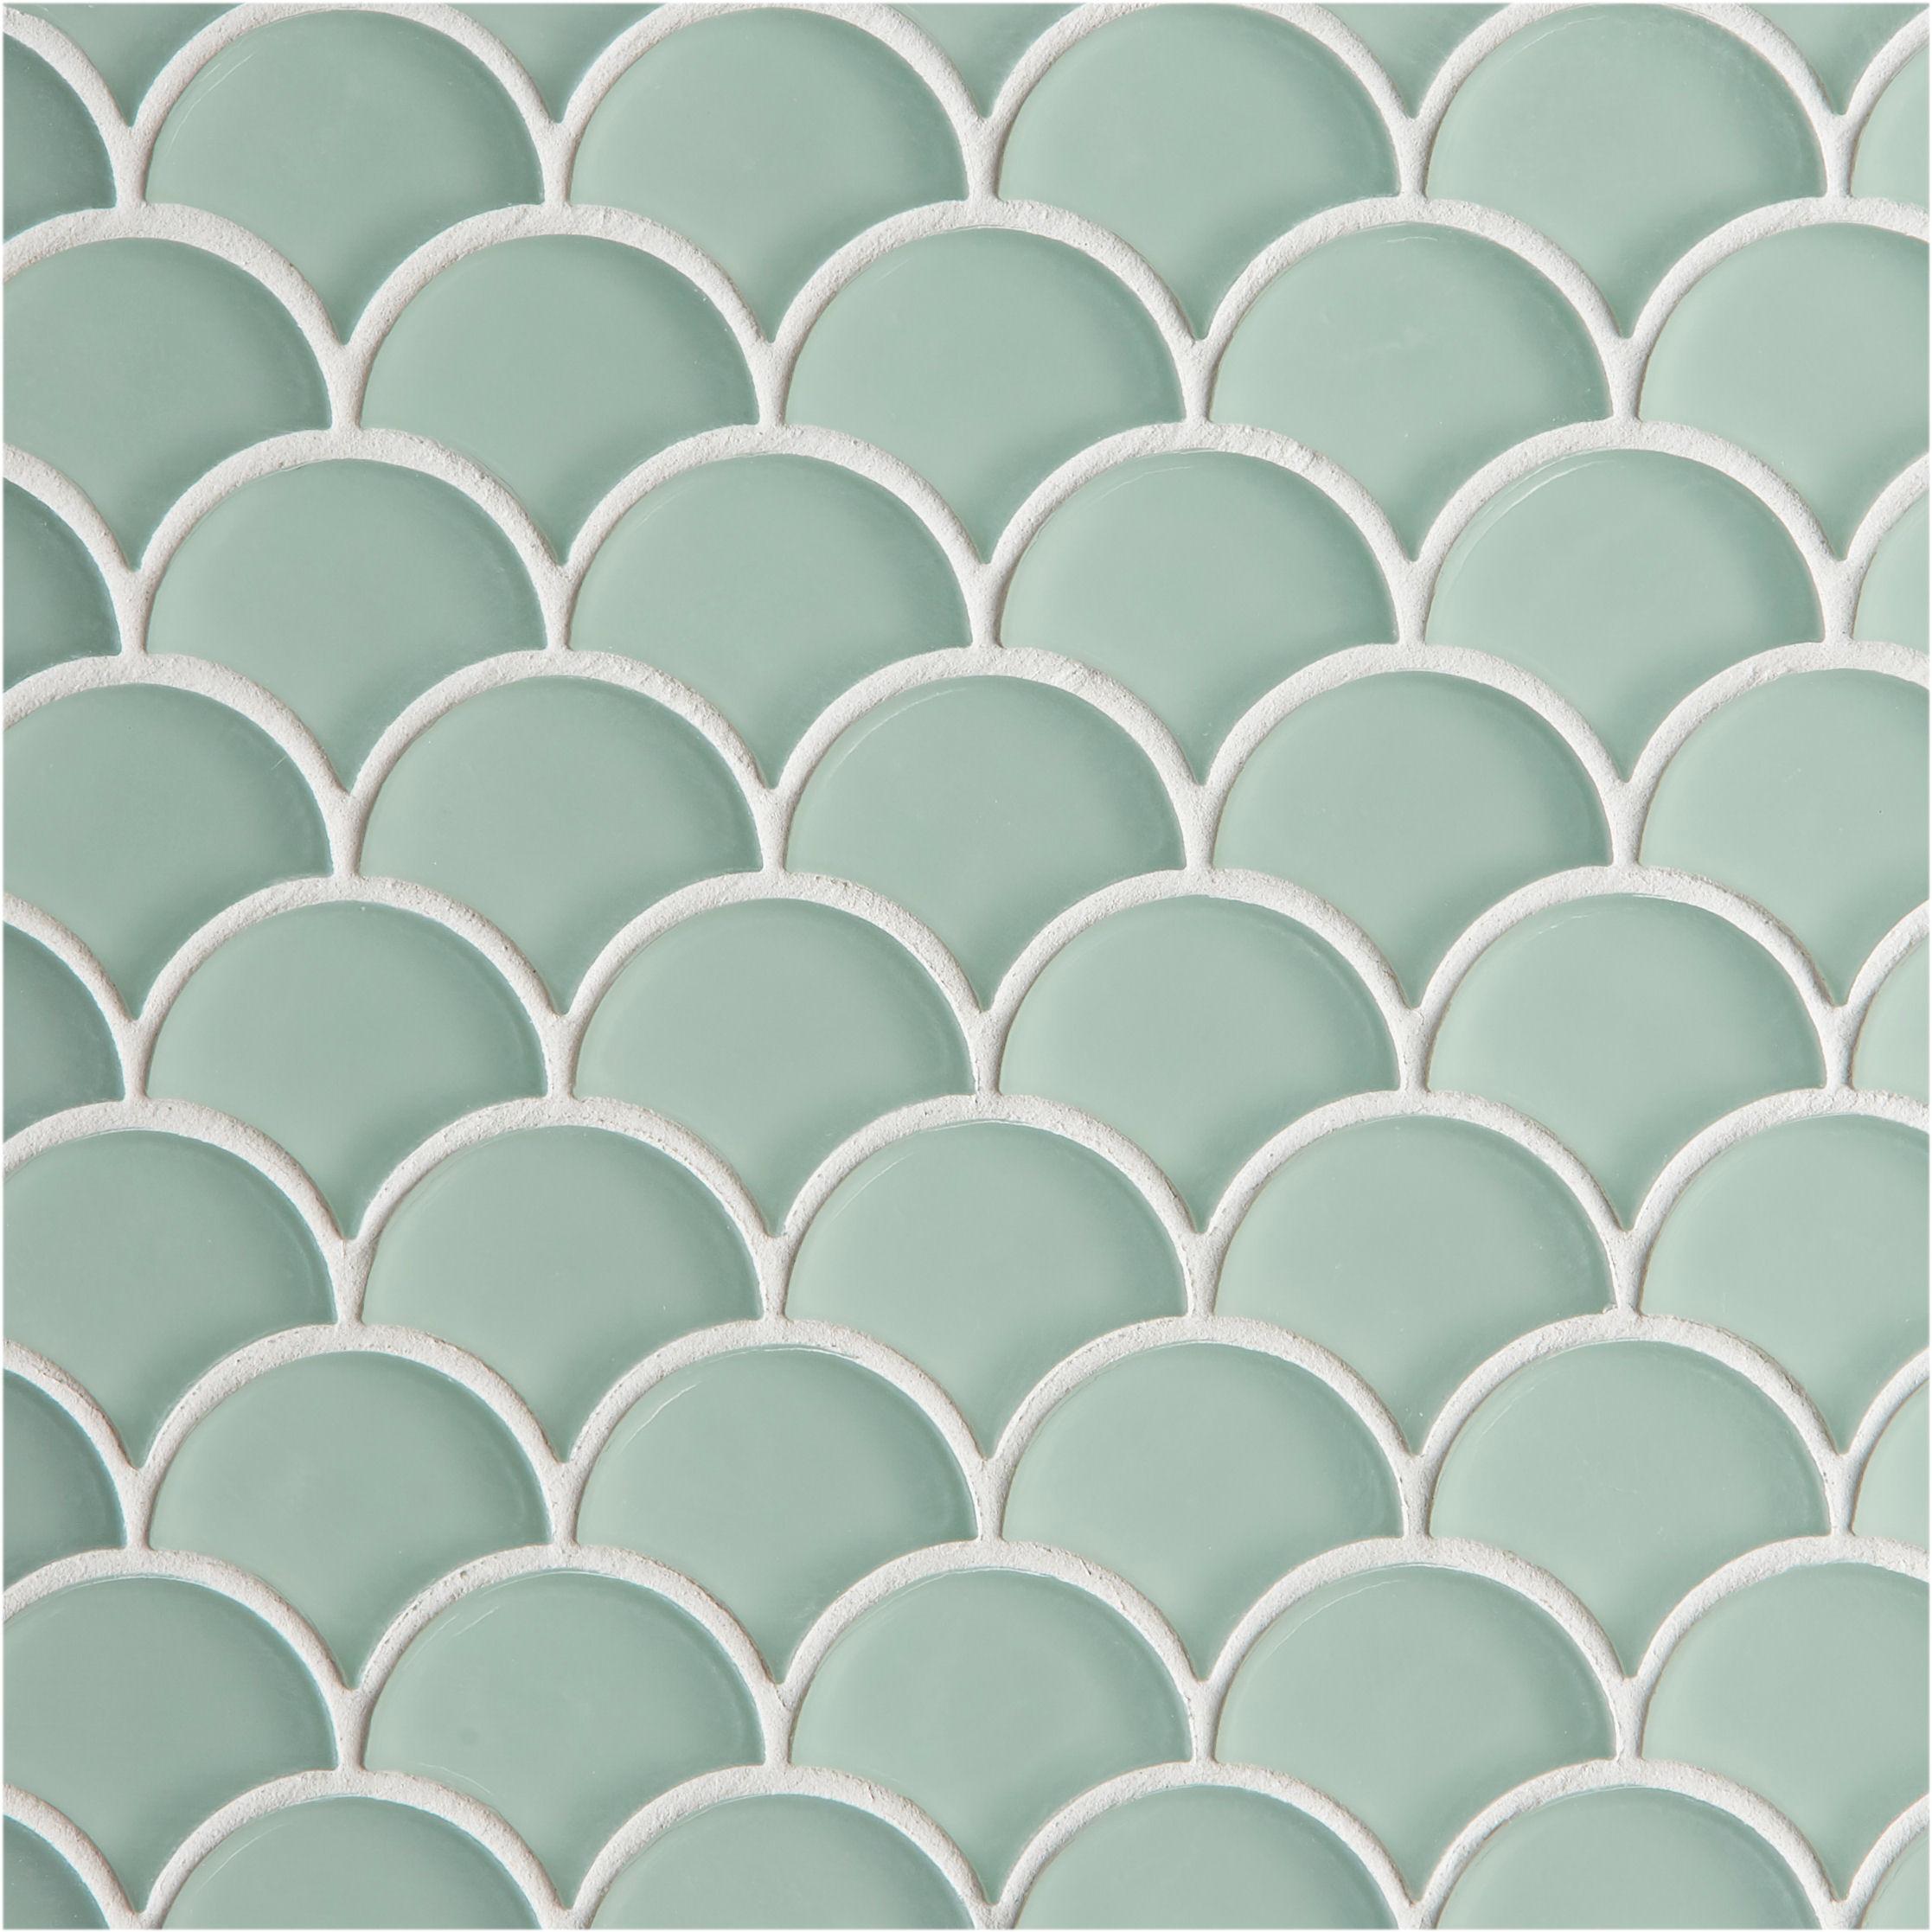 glacier green glass scallop mosaic tiles mandarin stone